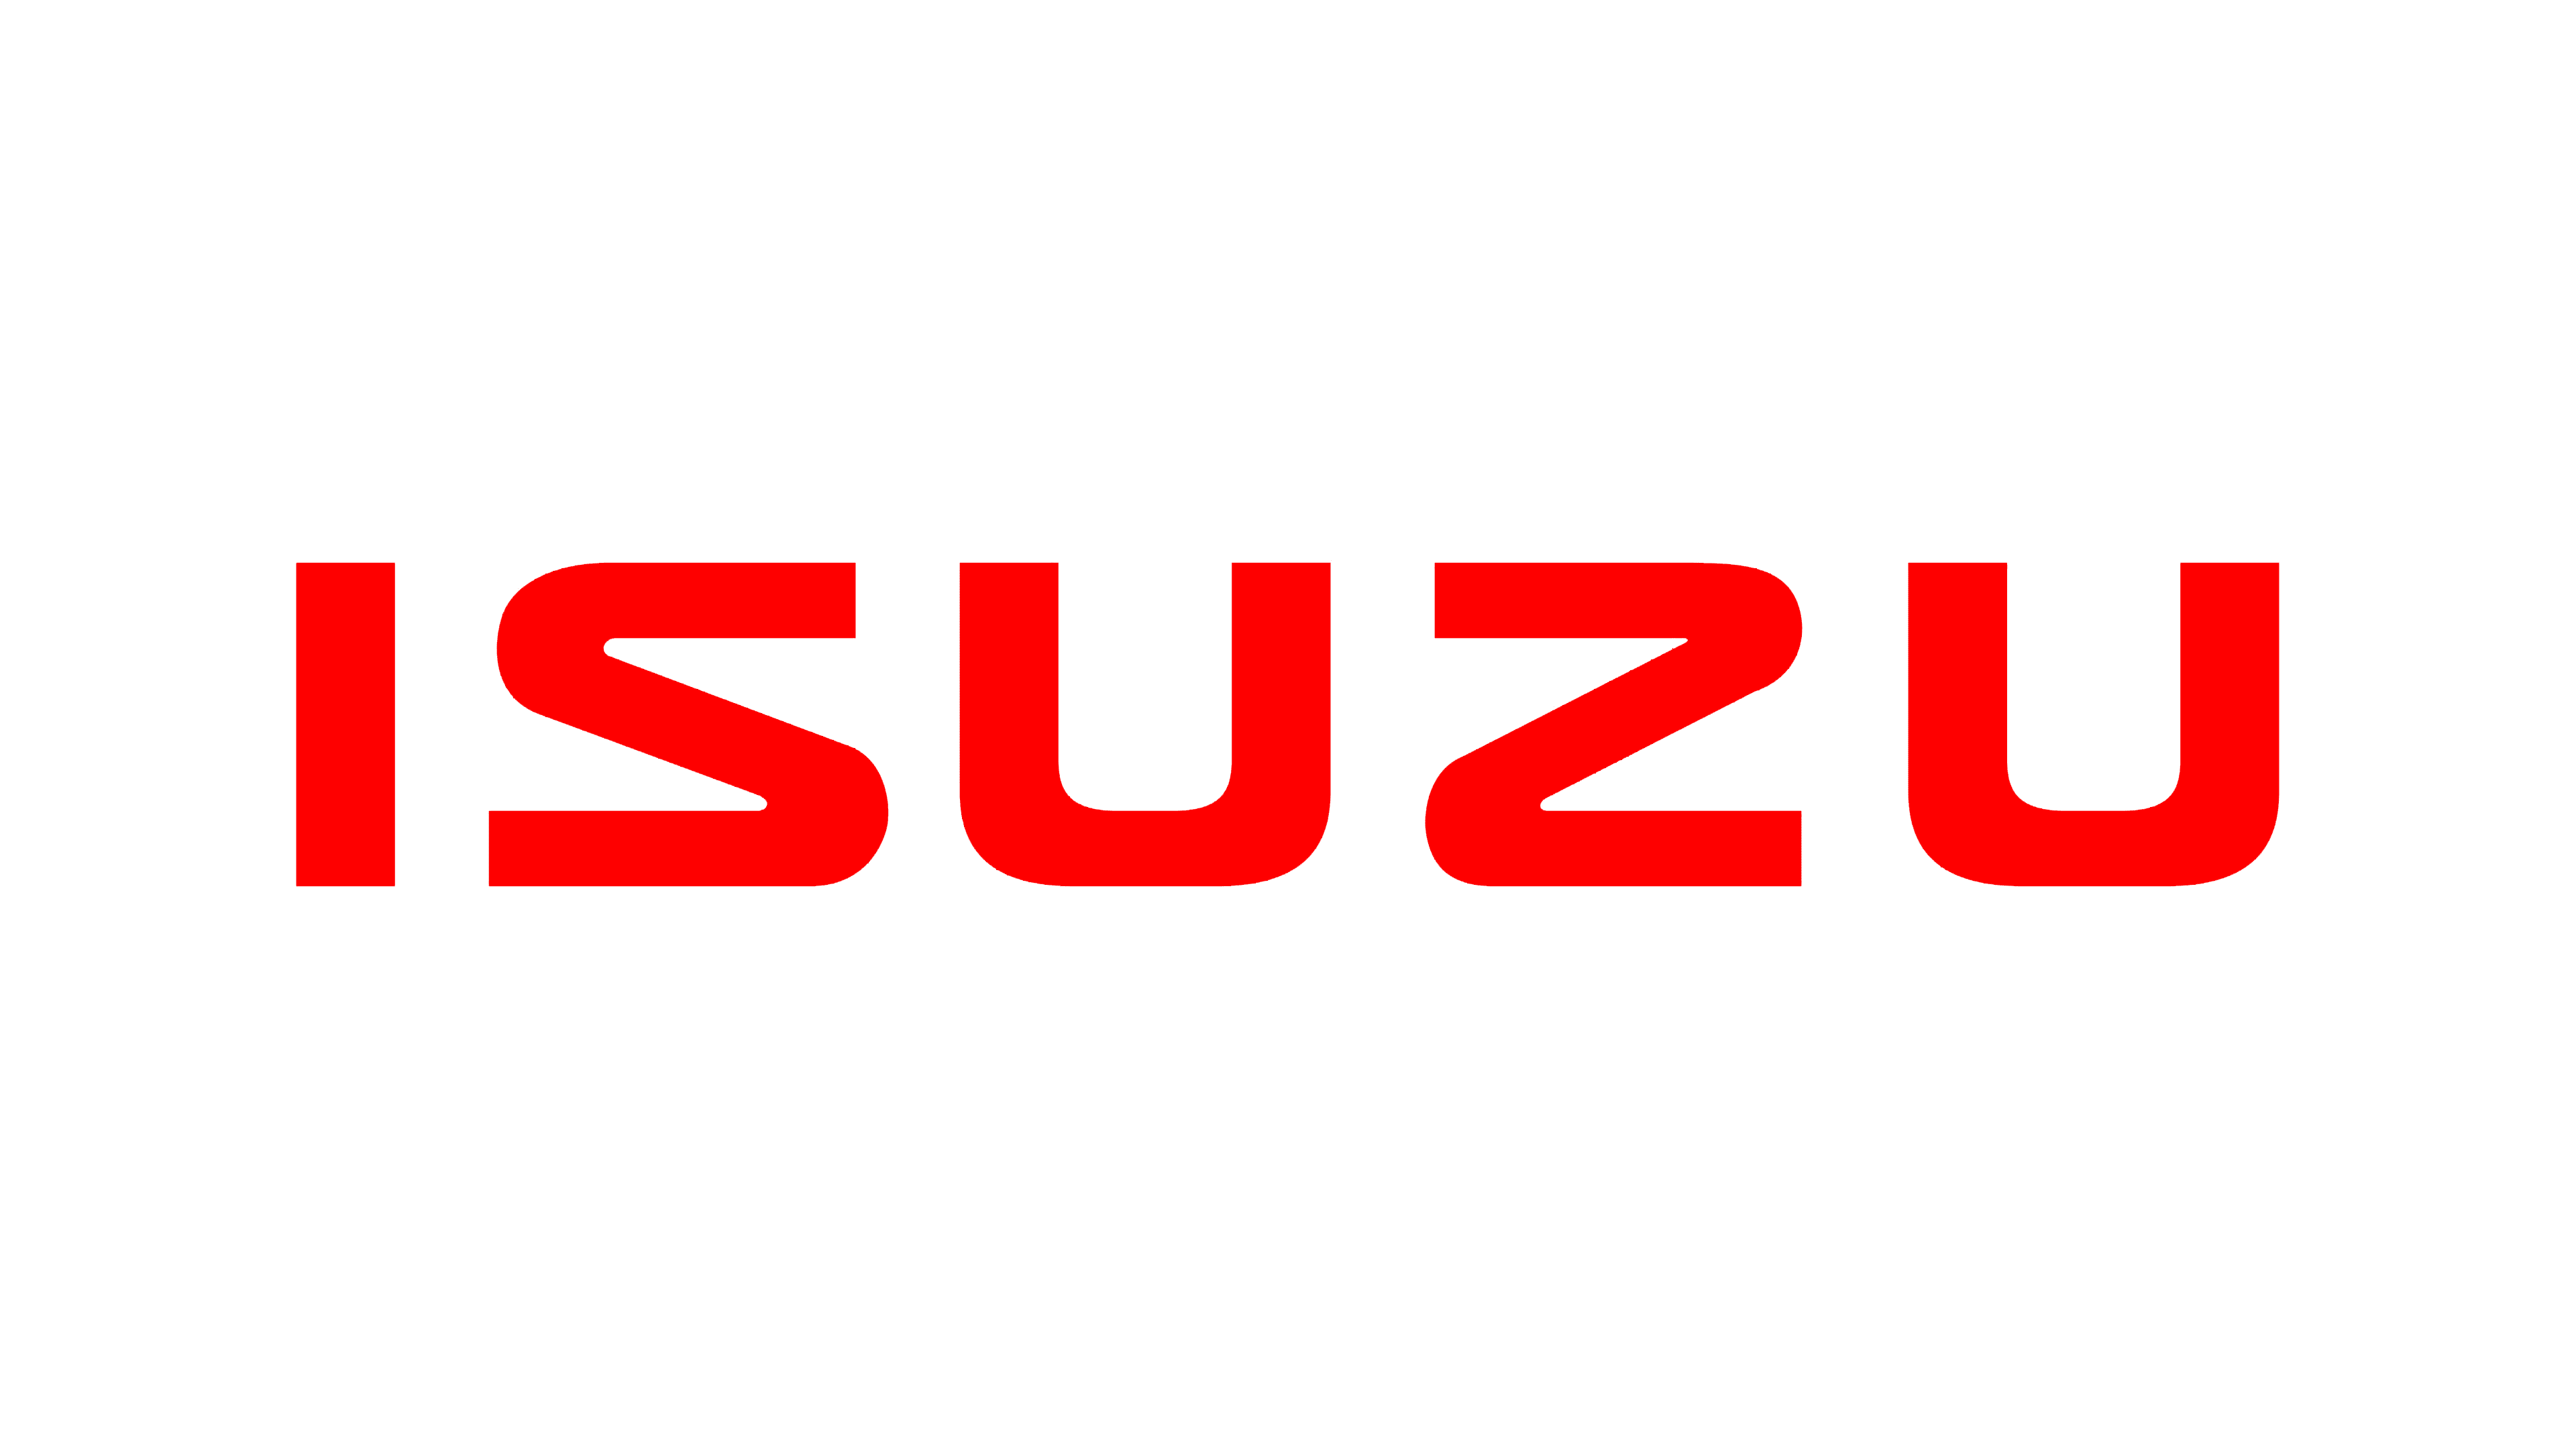 Buy Isuzu Trucks at JY Enterprises Inc